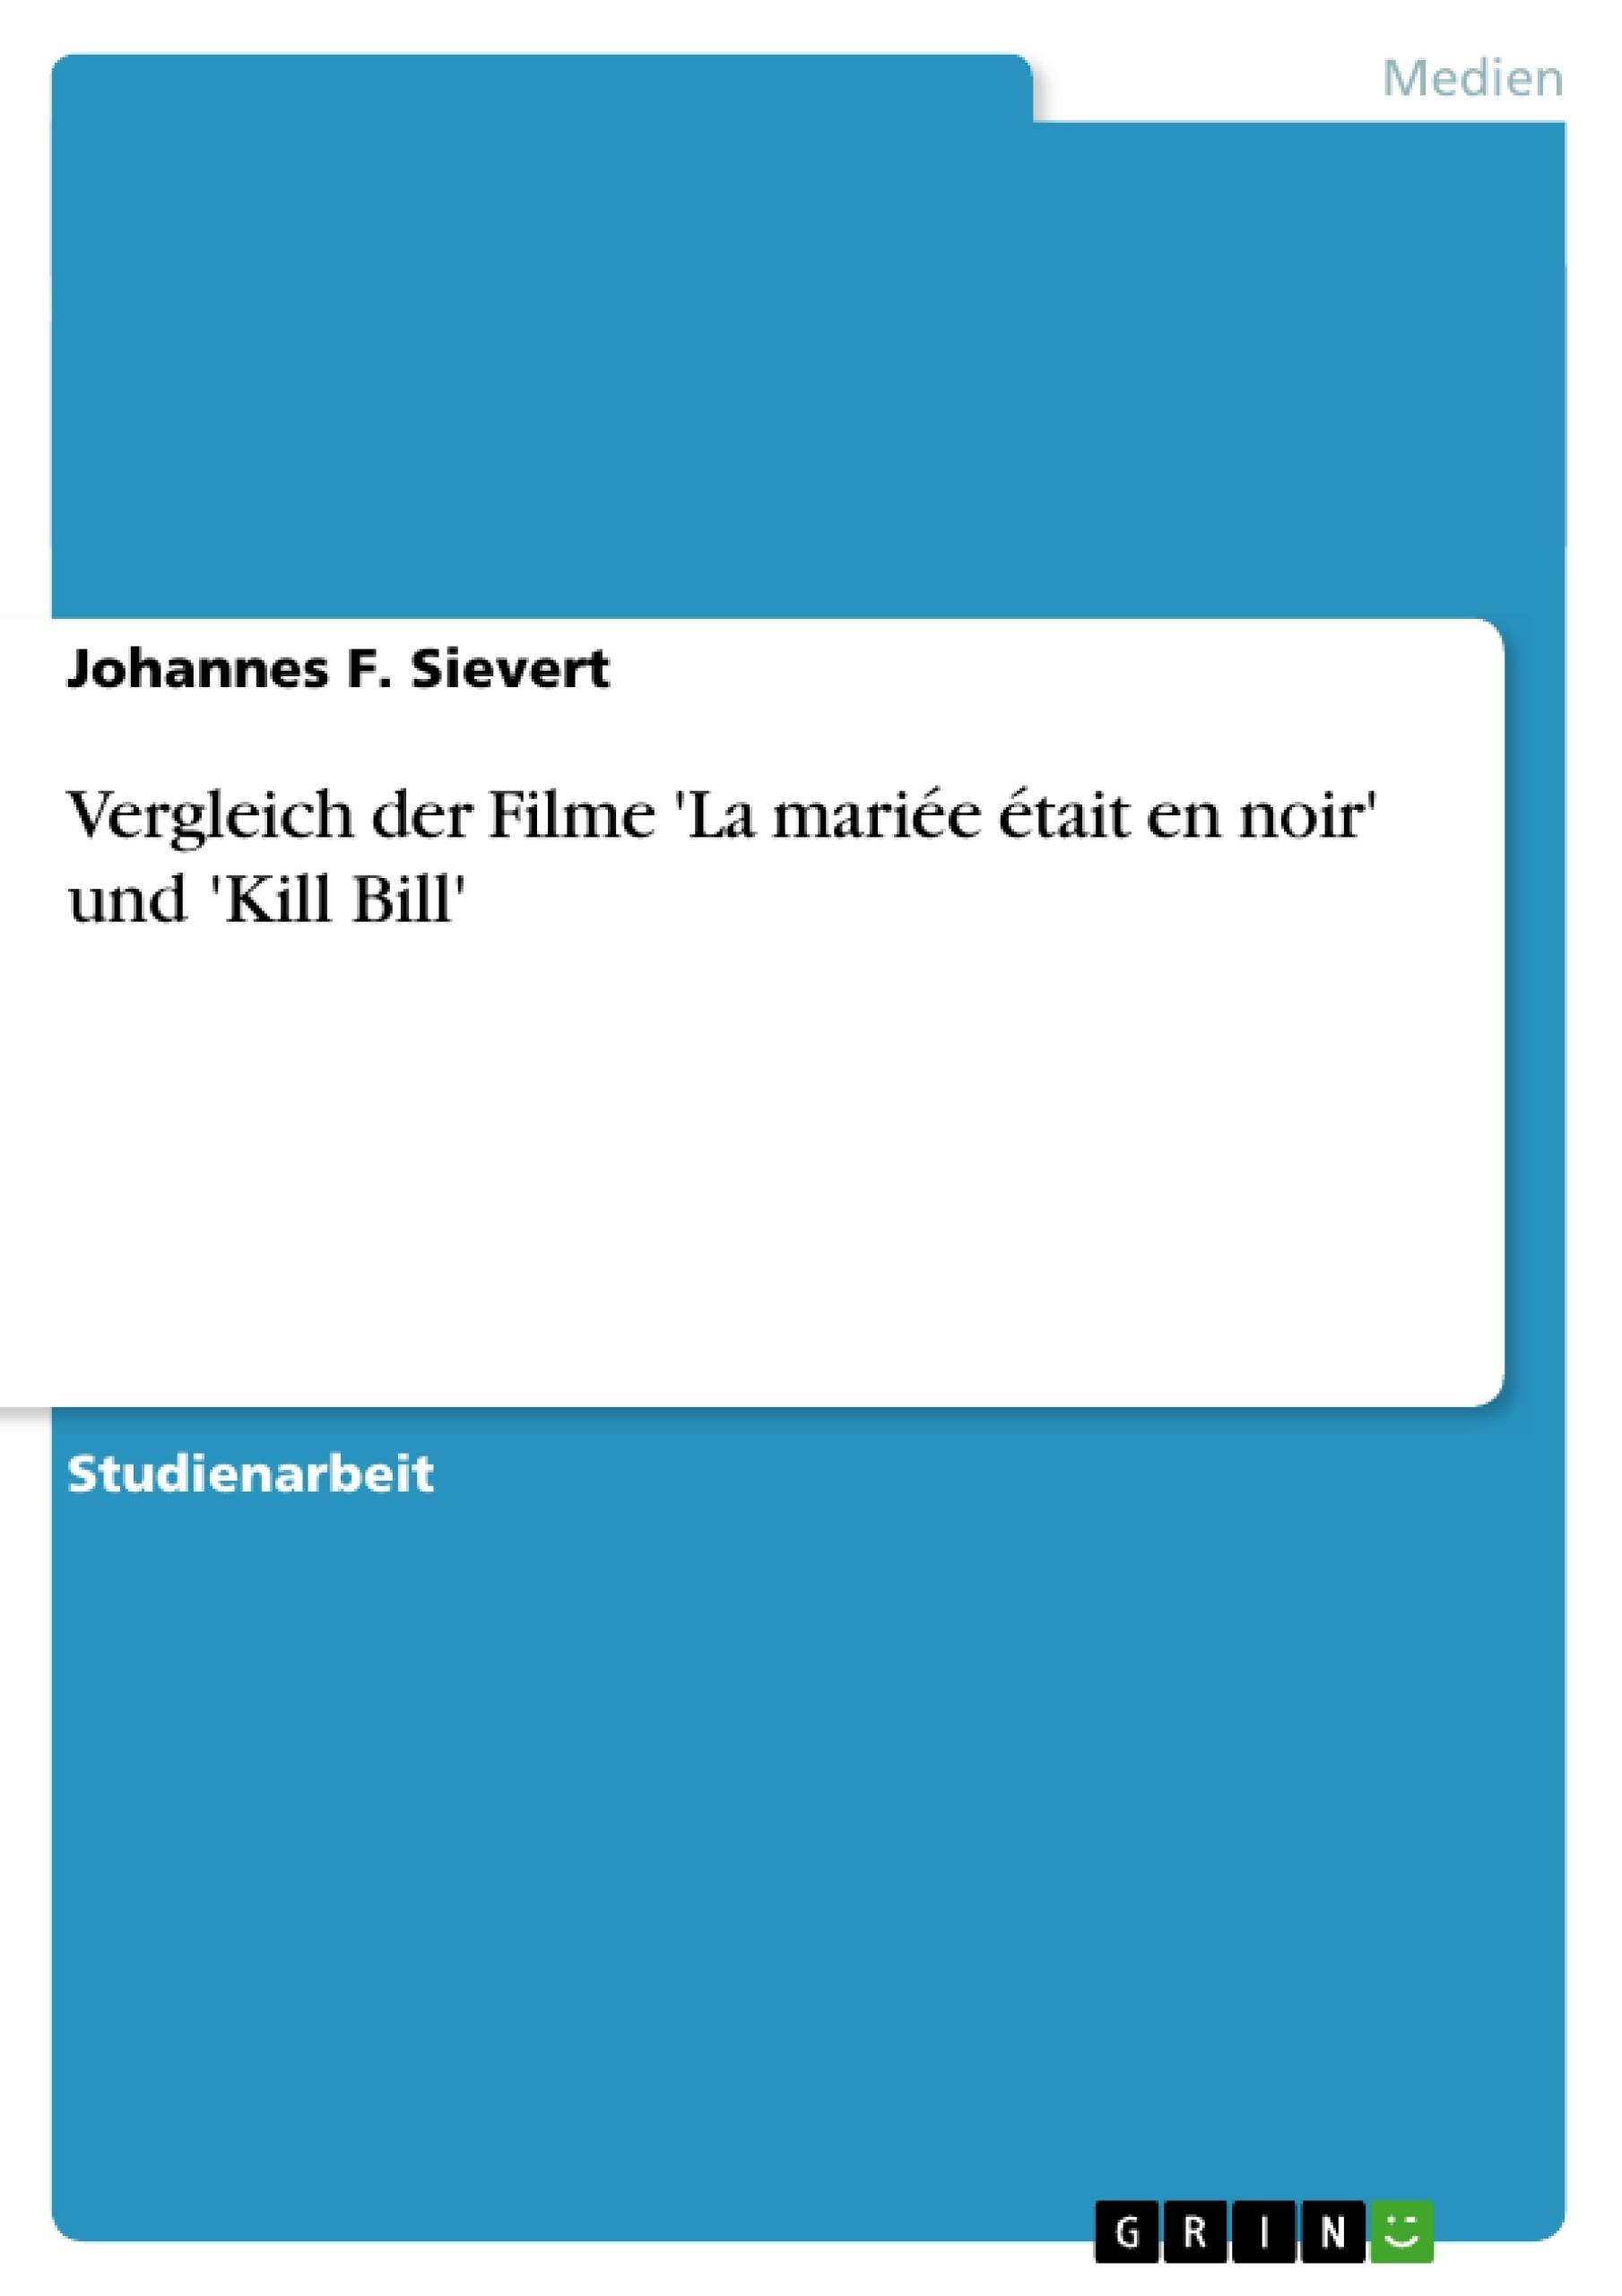 Titel: Vergleich der Filme 'La mariée était en noir' und 'Kill Bill'